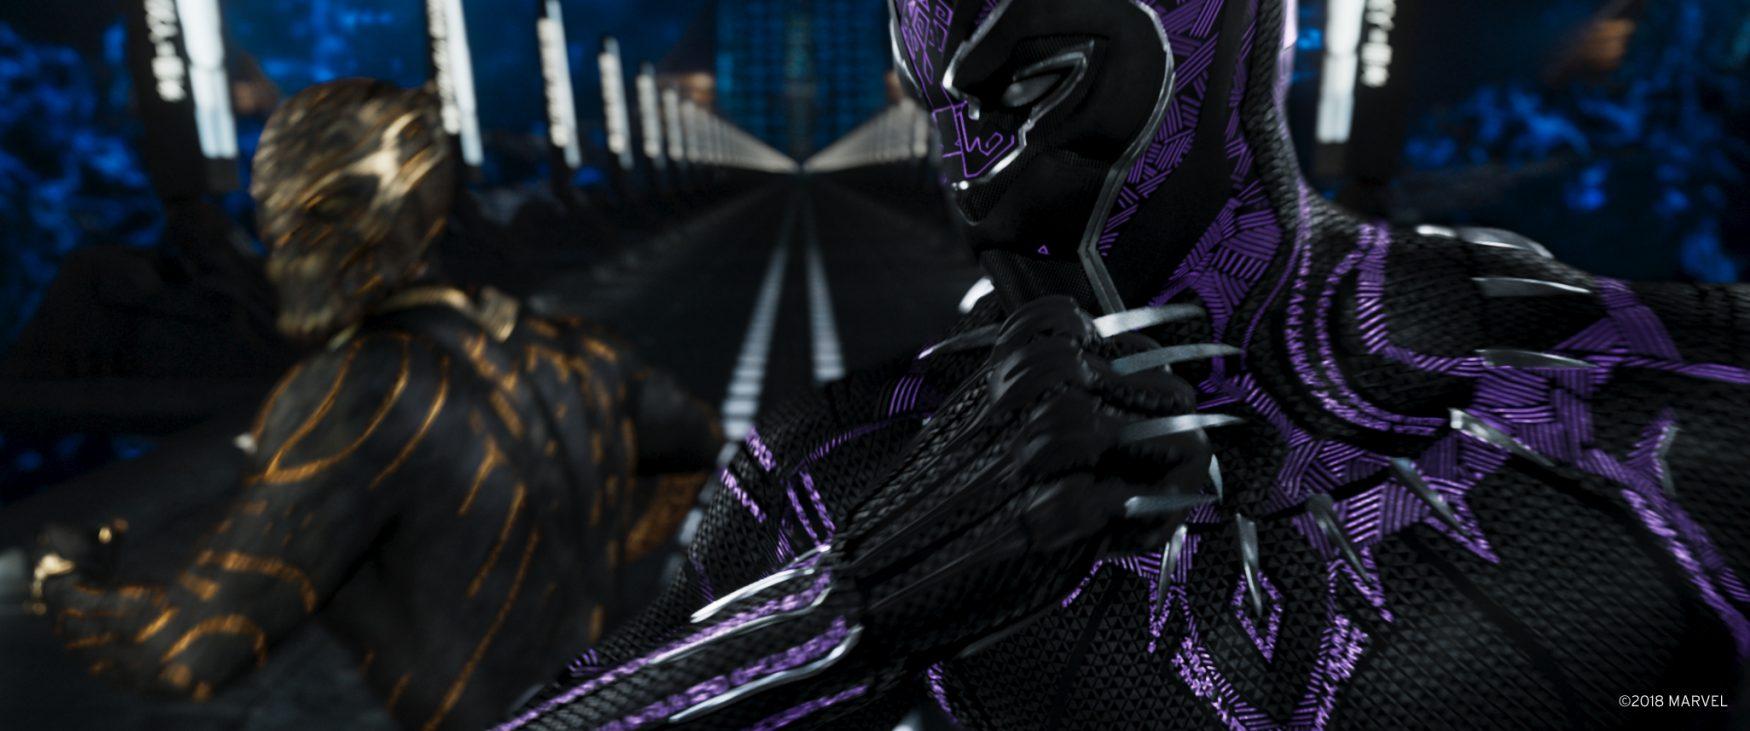 blackpanther and killmonger